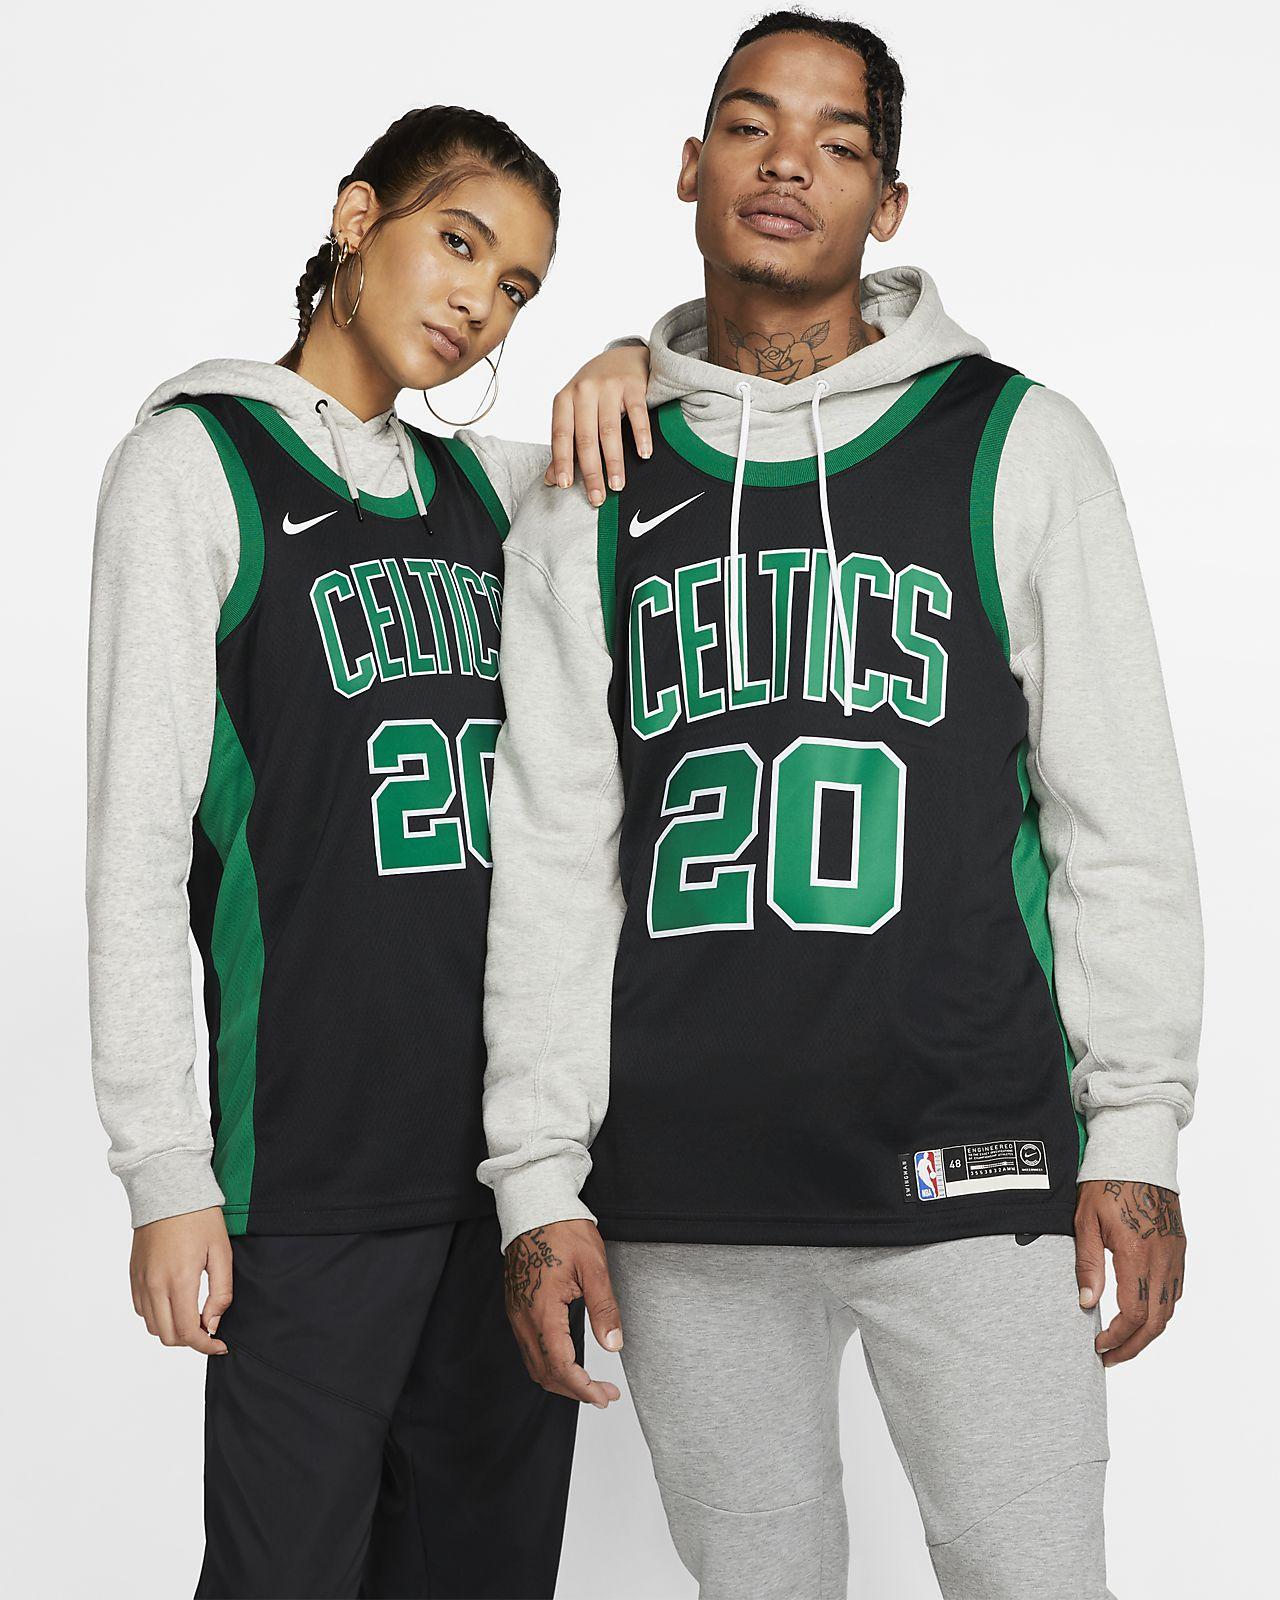 Maillot connecté Nike NBA Gordon Hayward Statement Edition Swingman (Boston Celtics) pour Homme